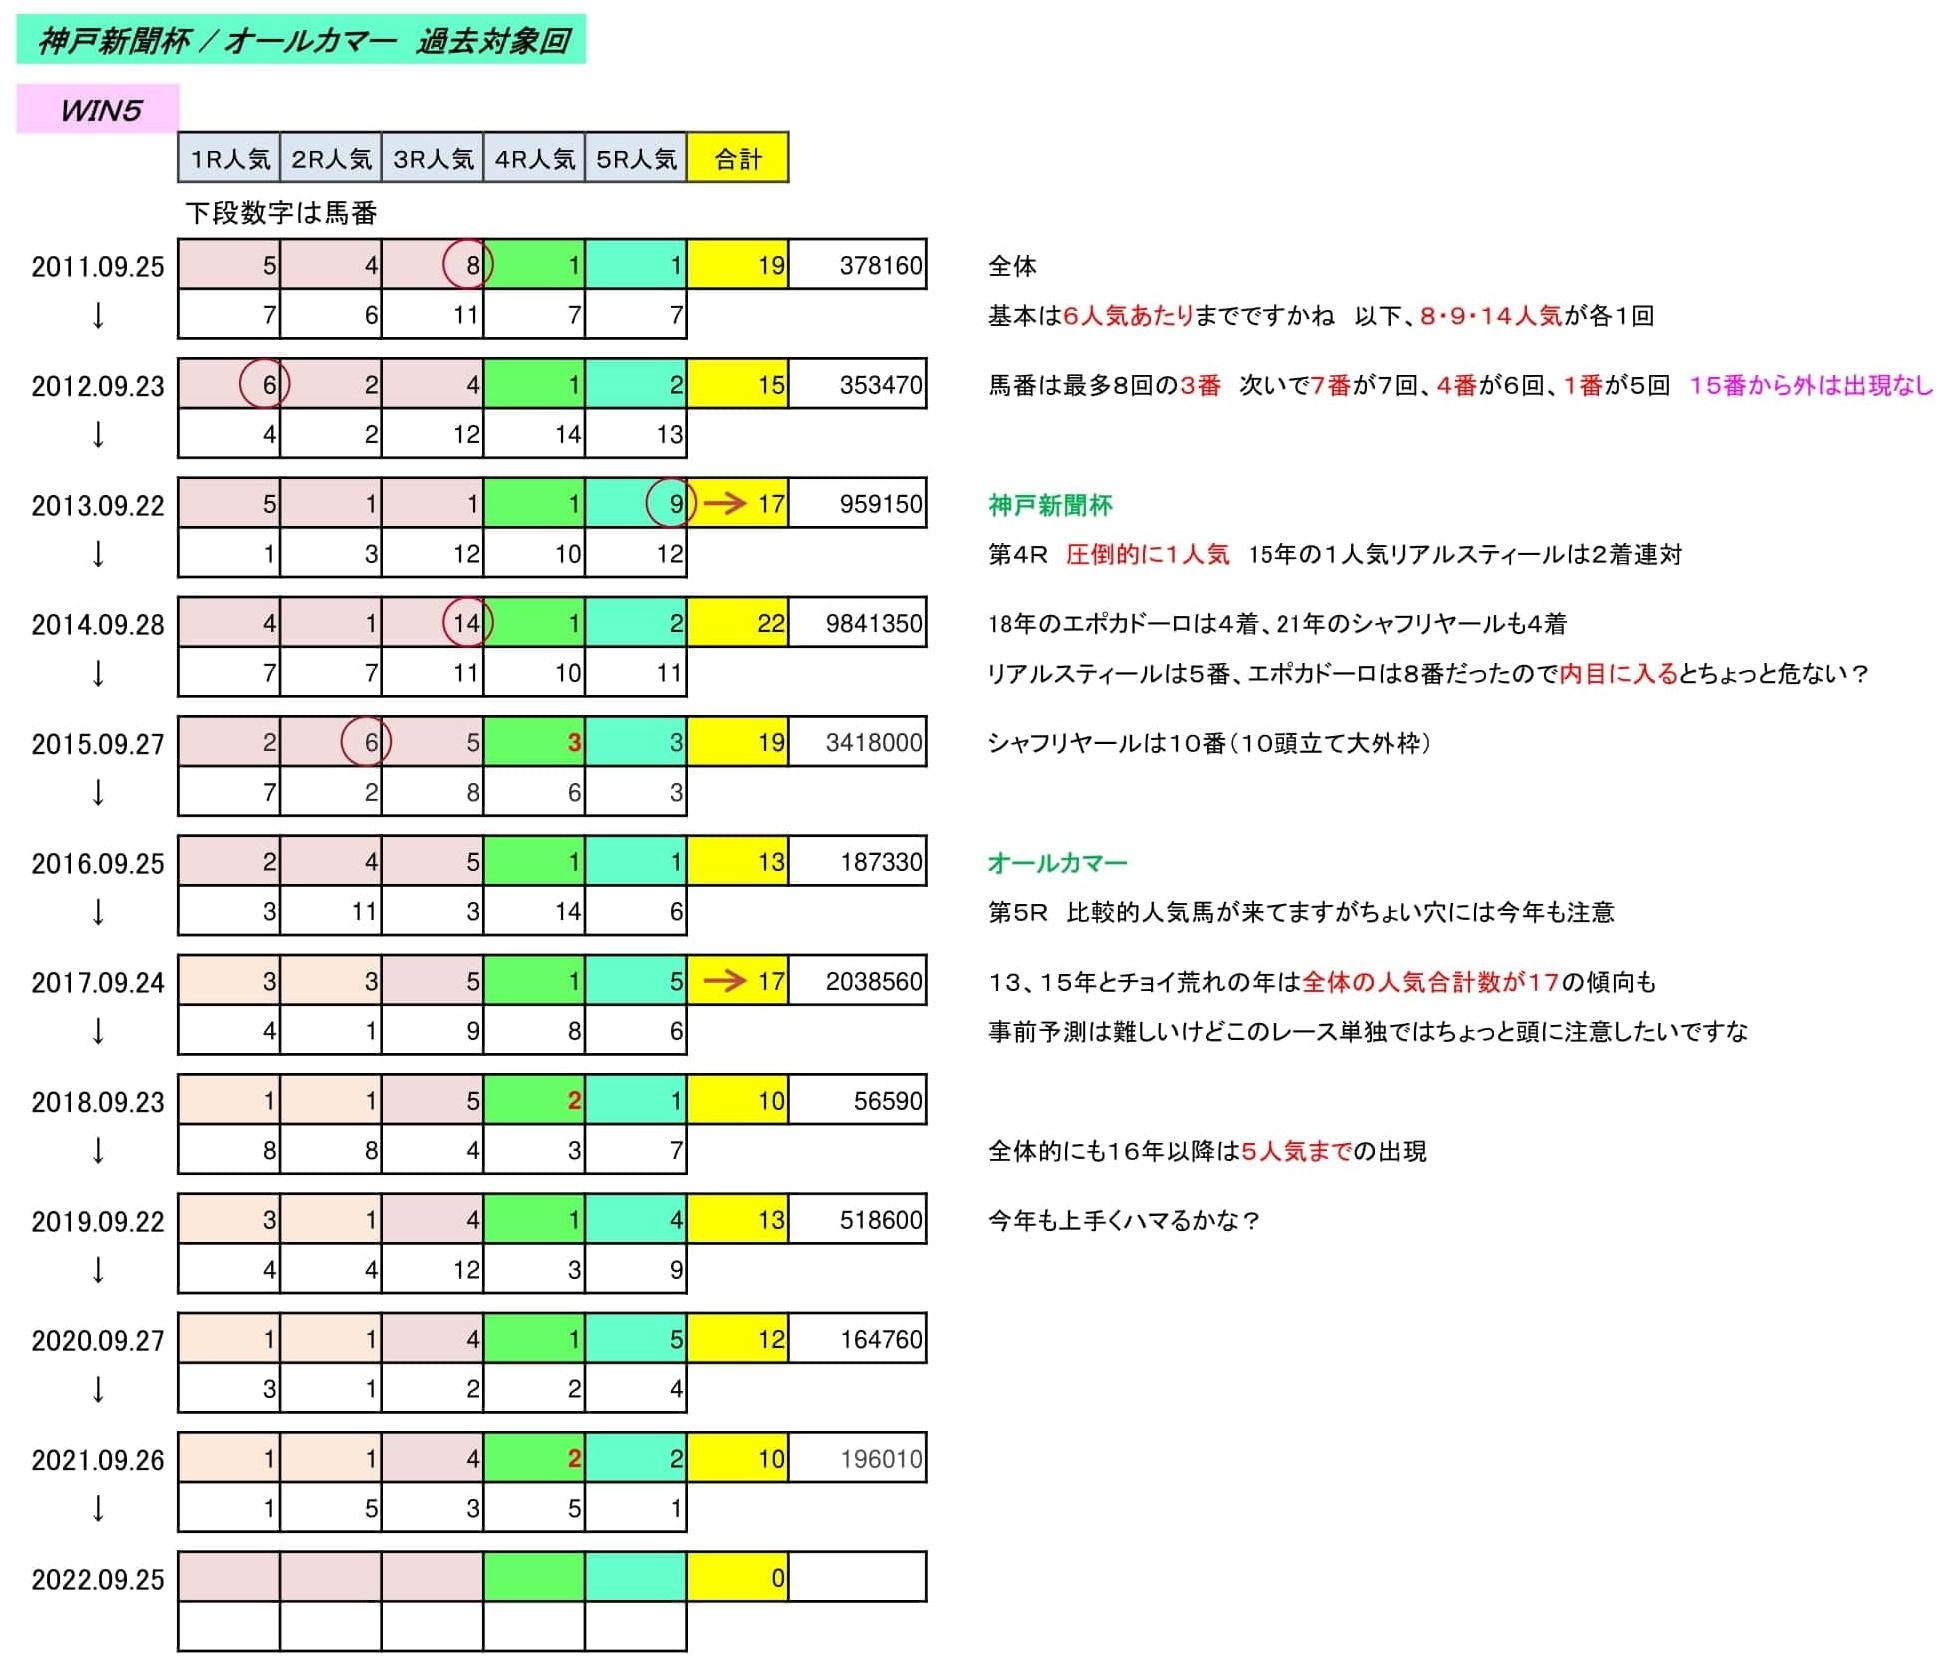 9_25_win5a.jpg